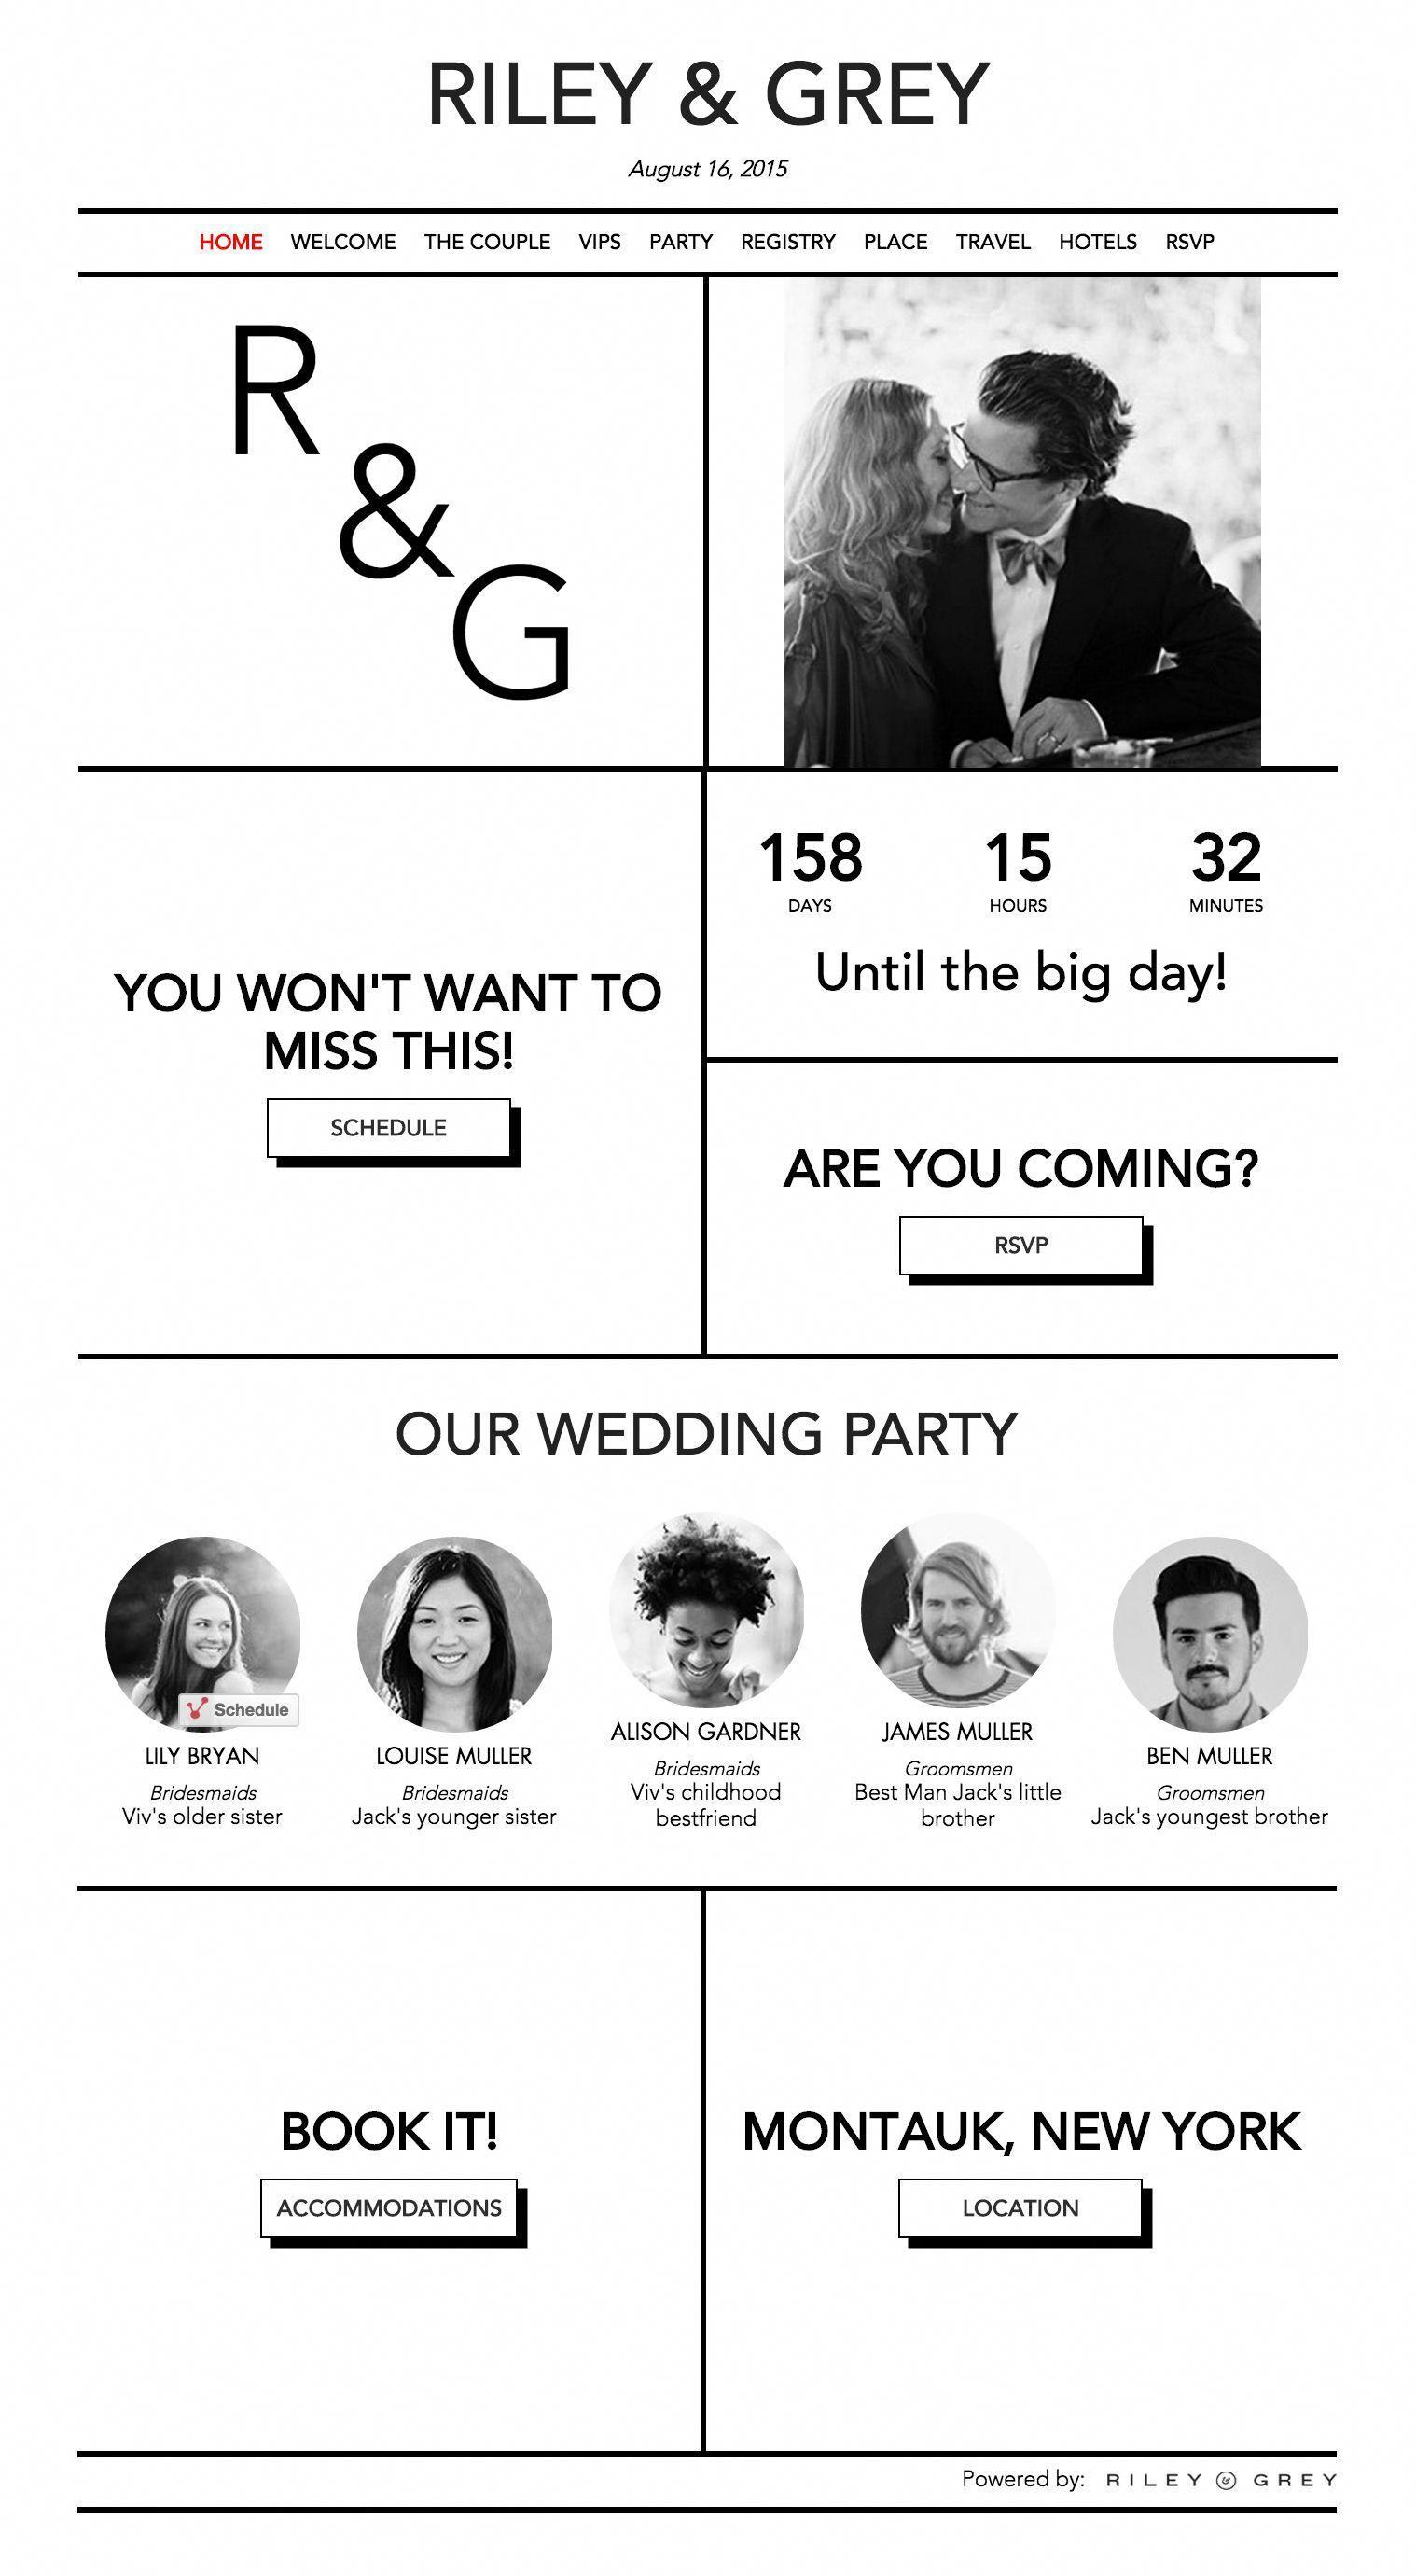 Post6219446857 Wedding website design, The knot wedding